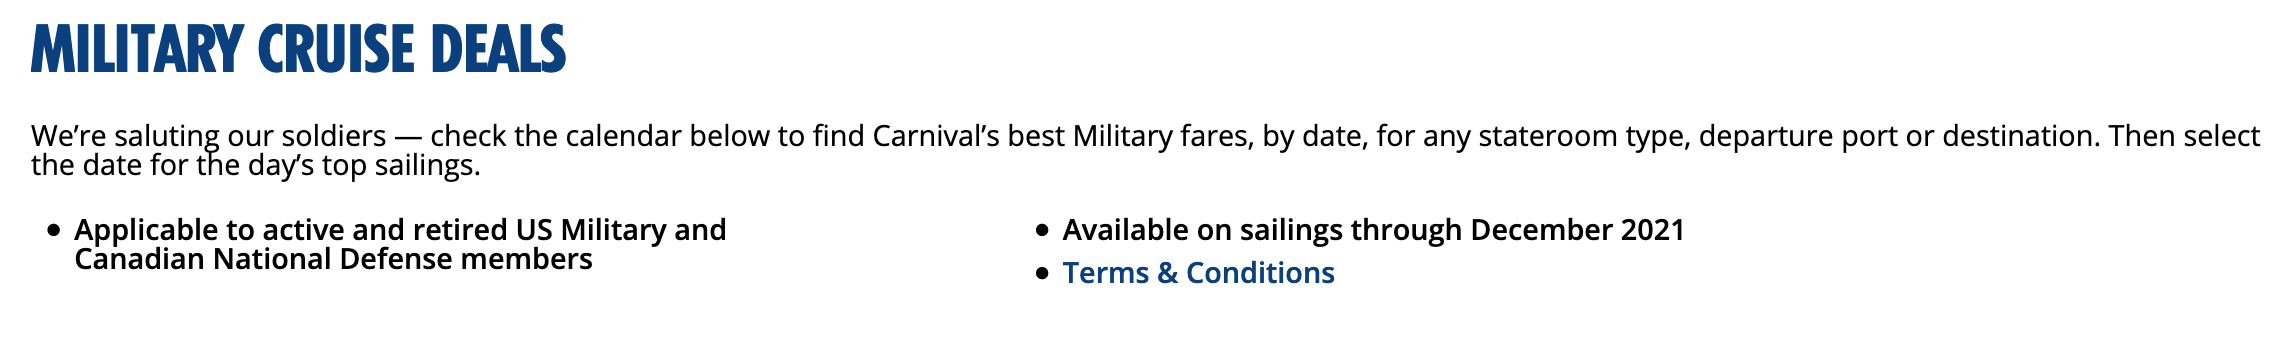 Carnival Cruise Lines Military Veteran Discounts